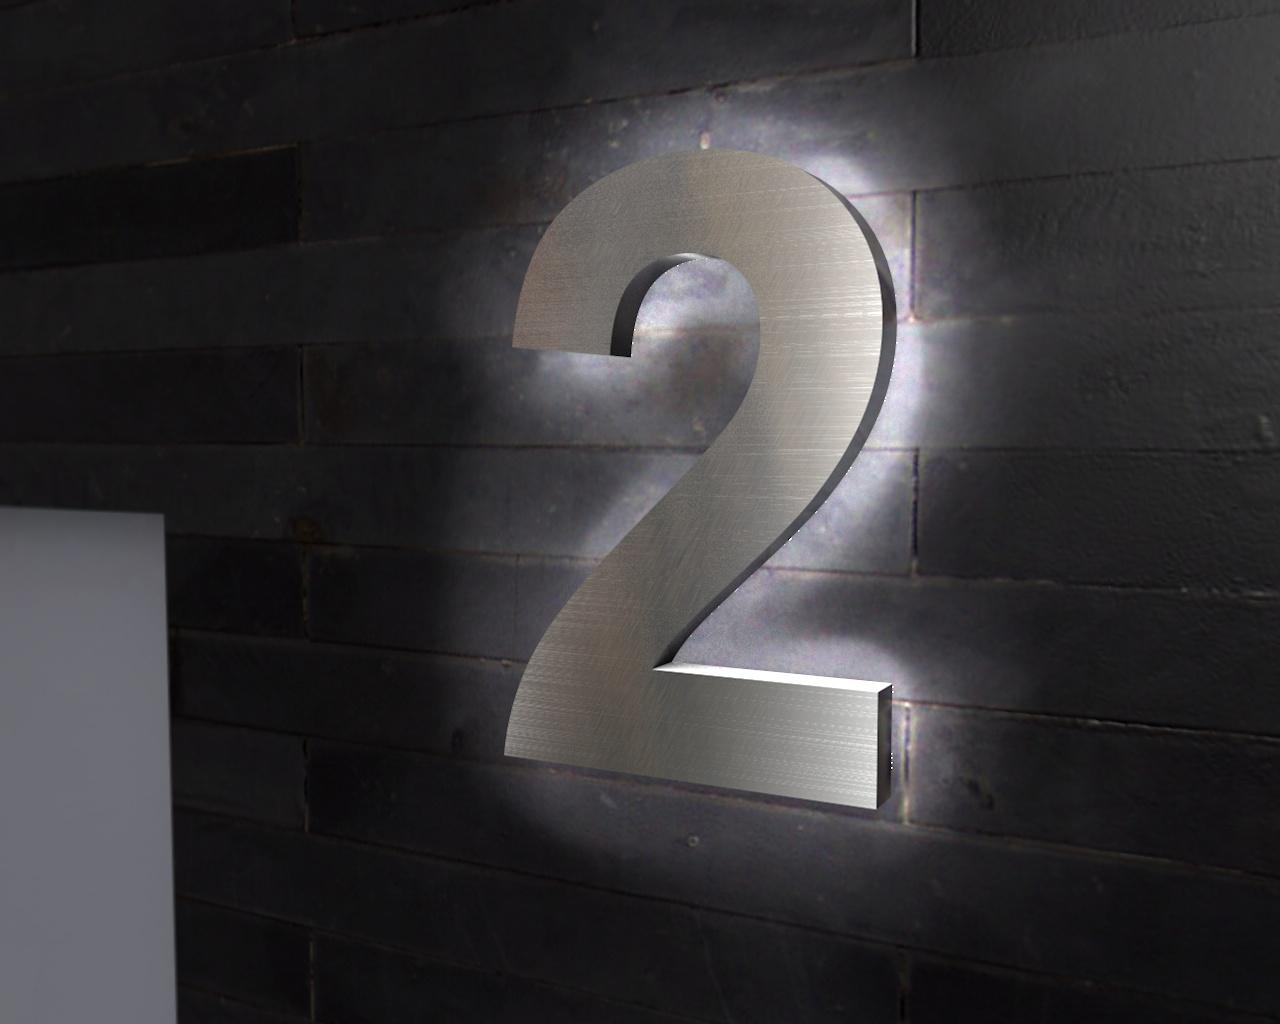 Beleuchtete Hausnummer 2 Ambilight